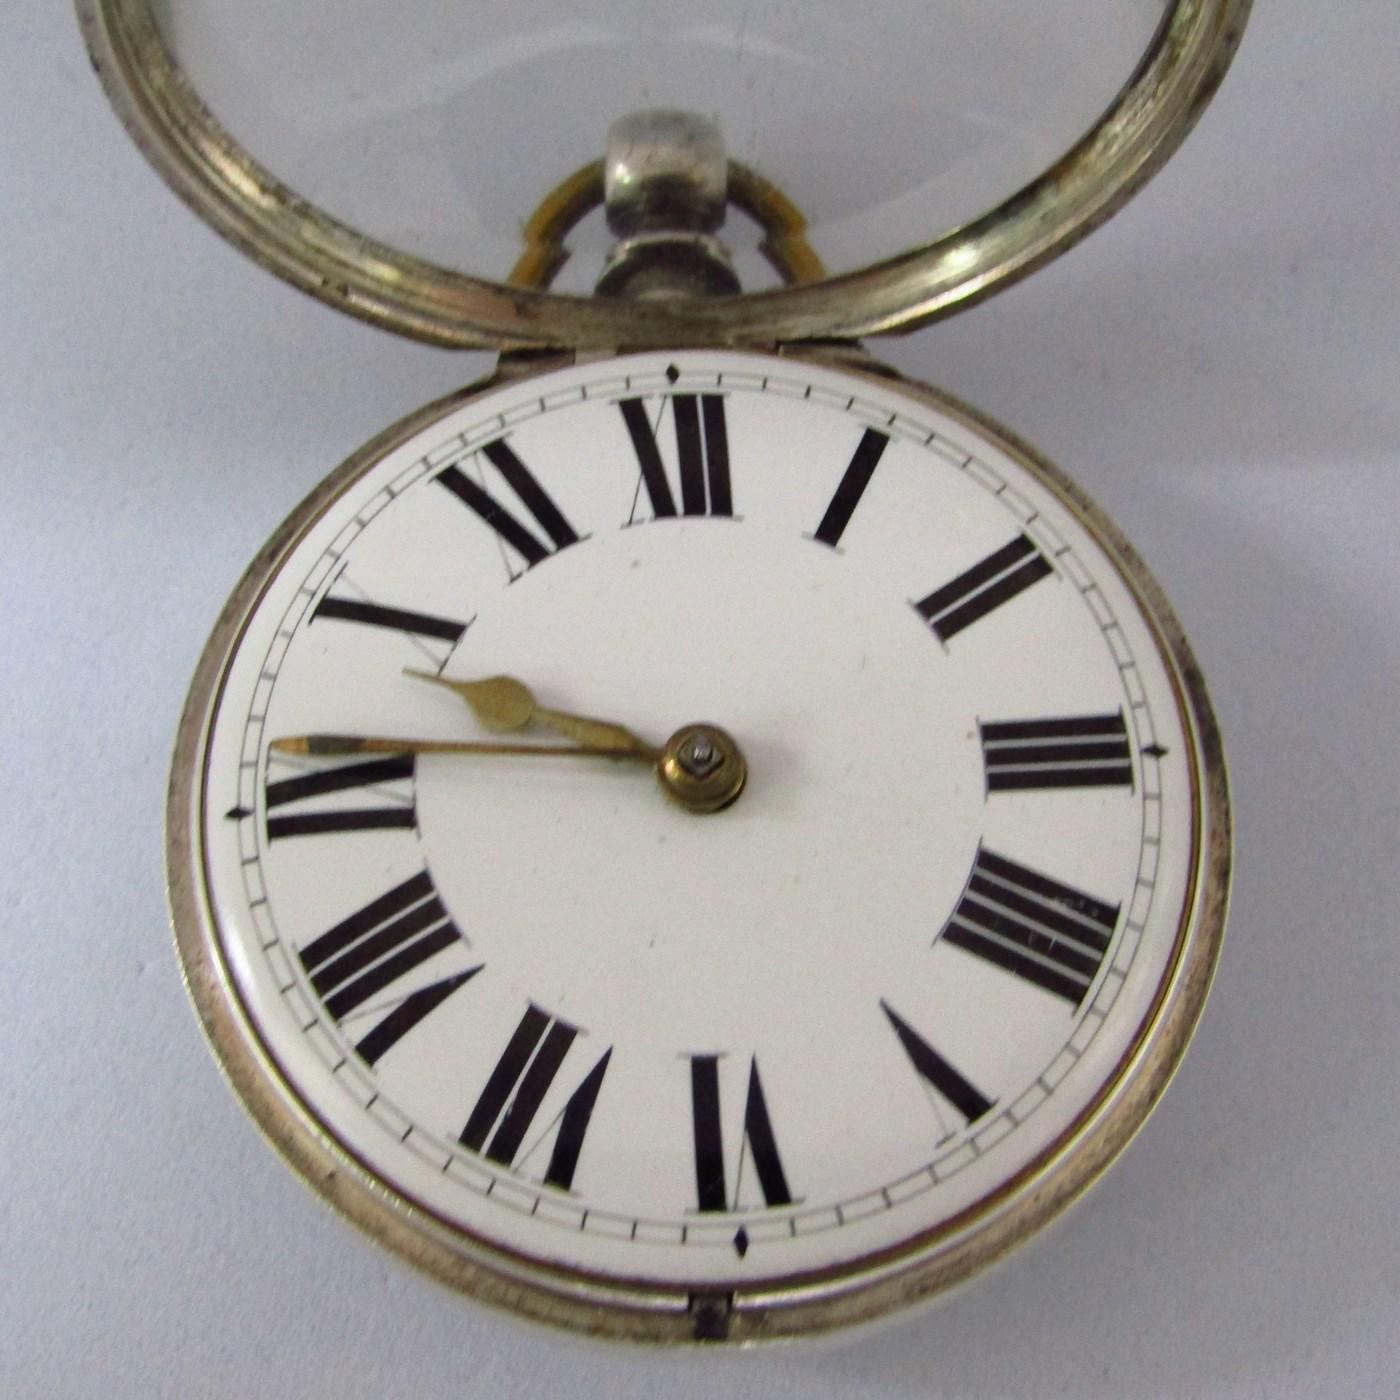 DAVEY & SONS (Londres, 1851). Reloj de Bolsillo Lepine, Verge Fusee (Catalino).